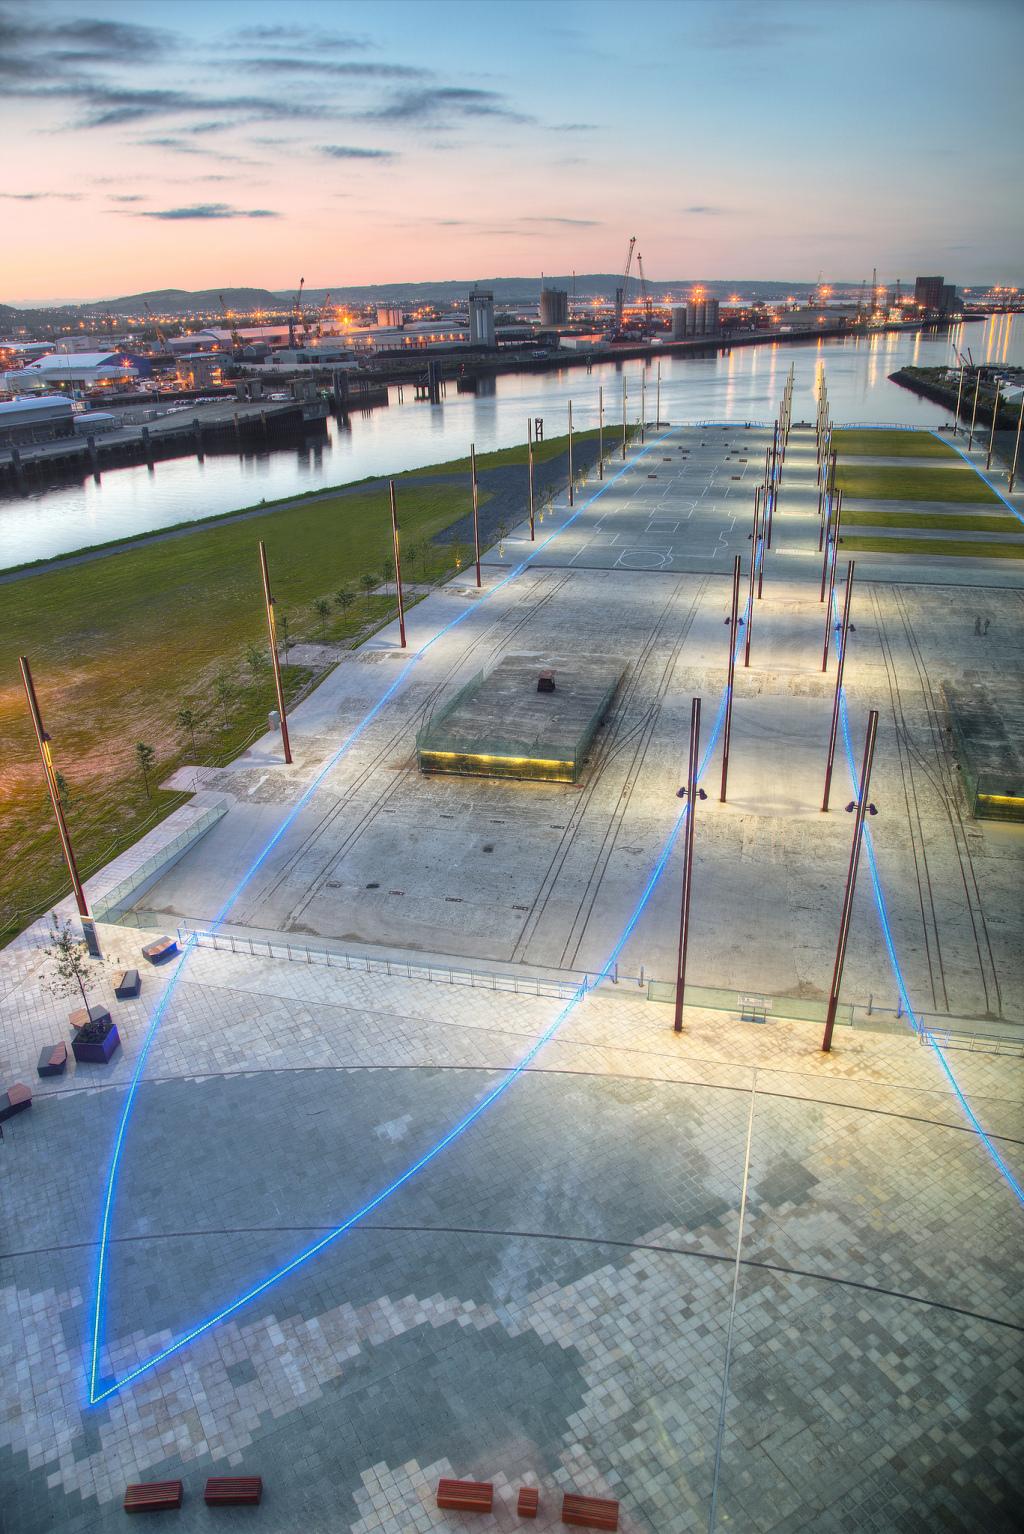 Titanic Belfast - ship outline and memorial garden